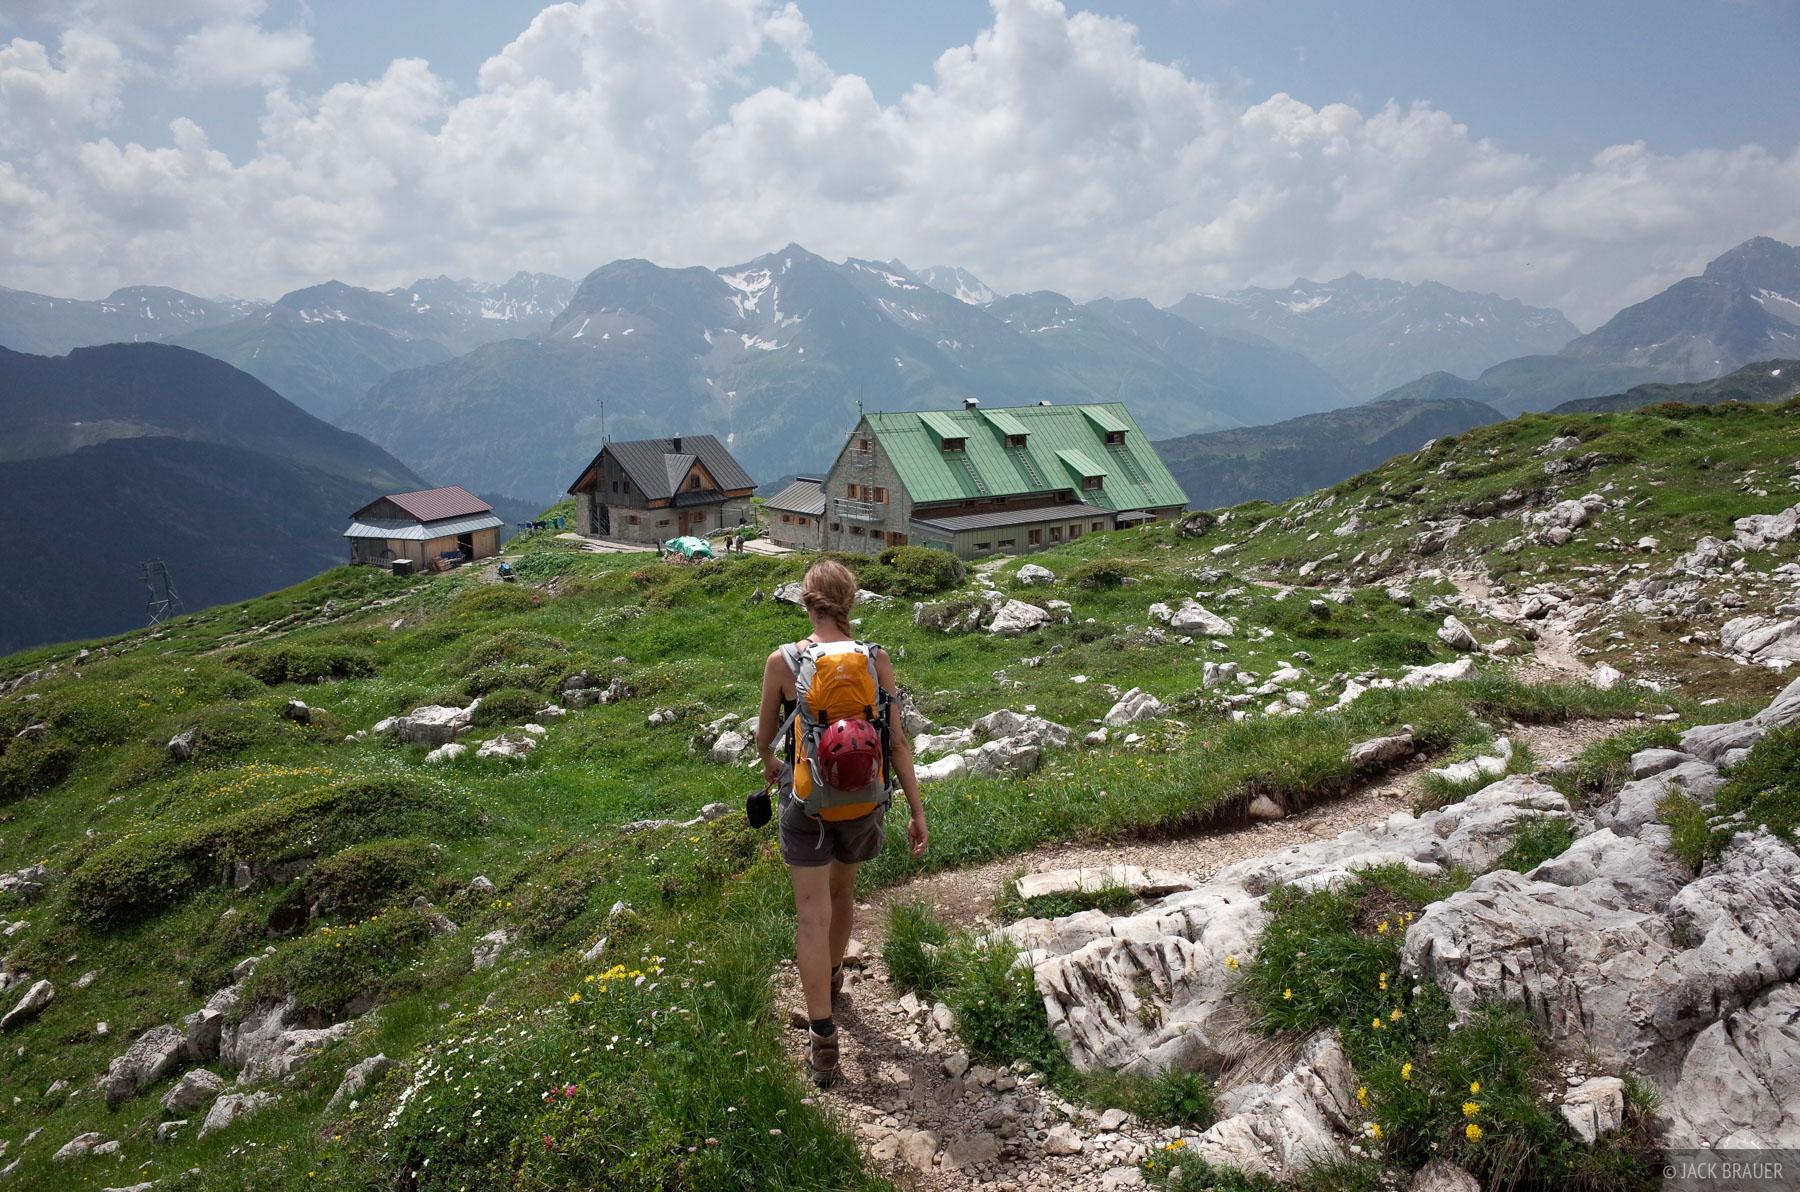 Allgäuer Alps, Germany, Mindelheimer, hut, Alps, photo